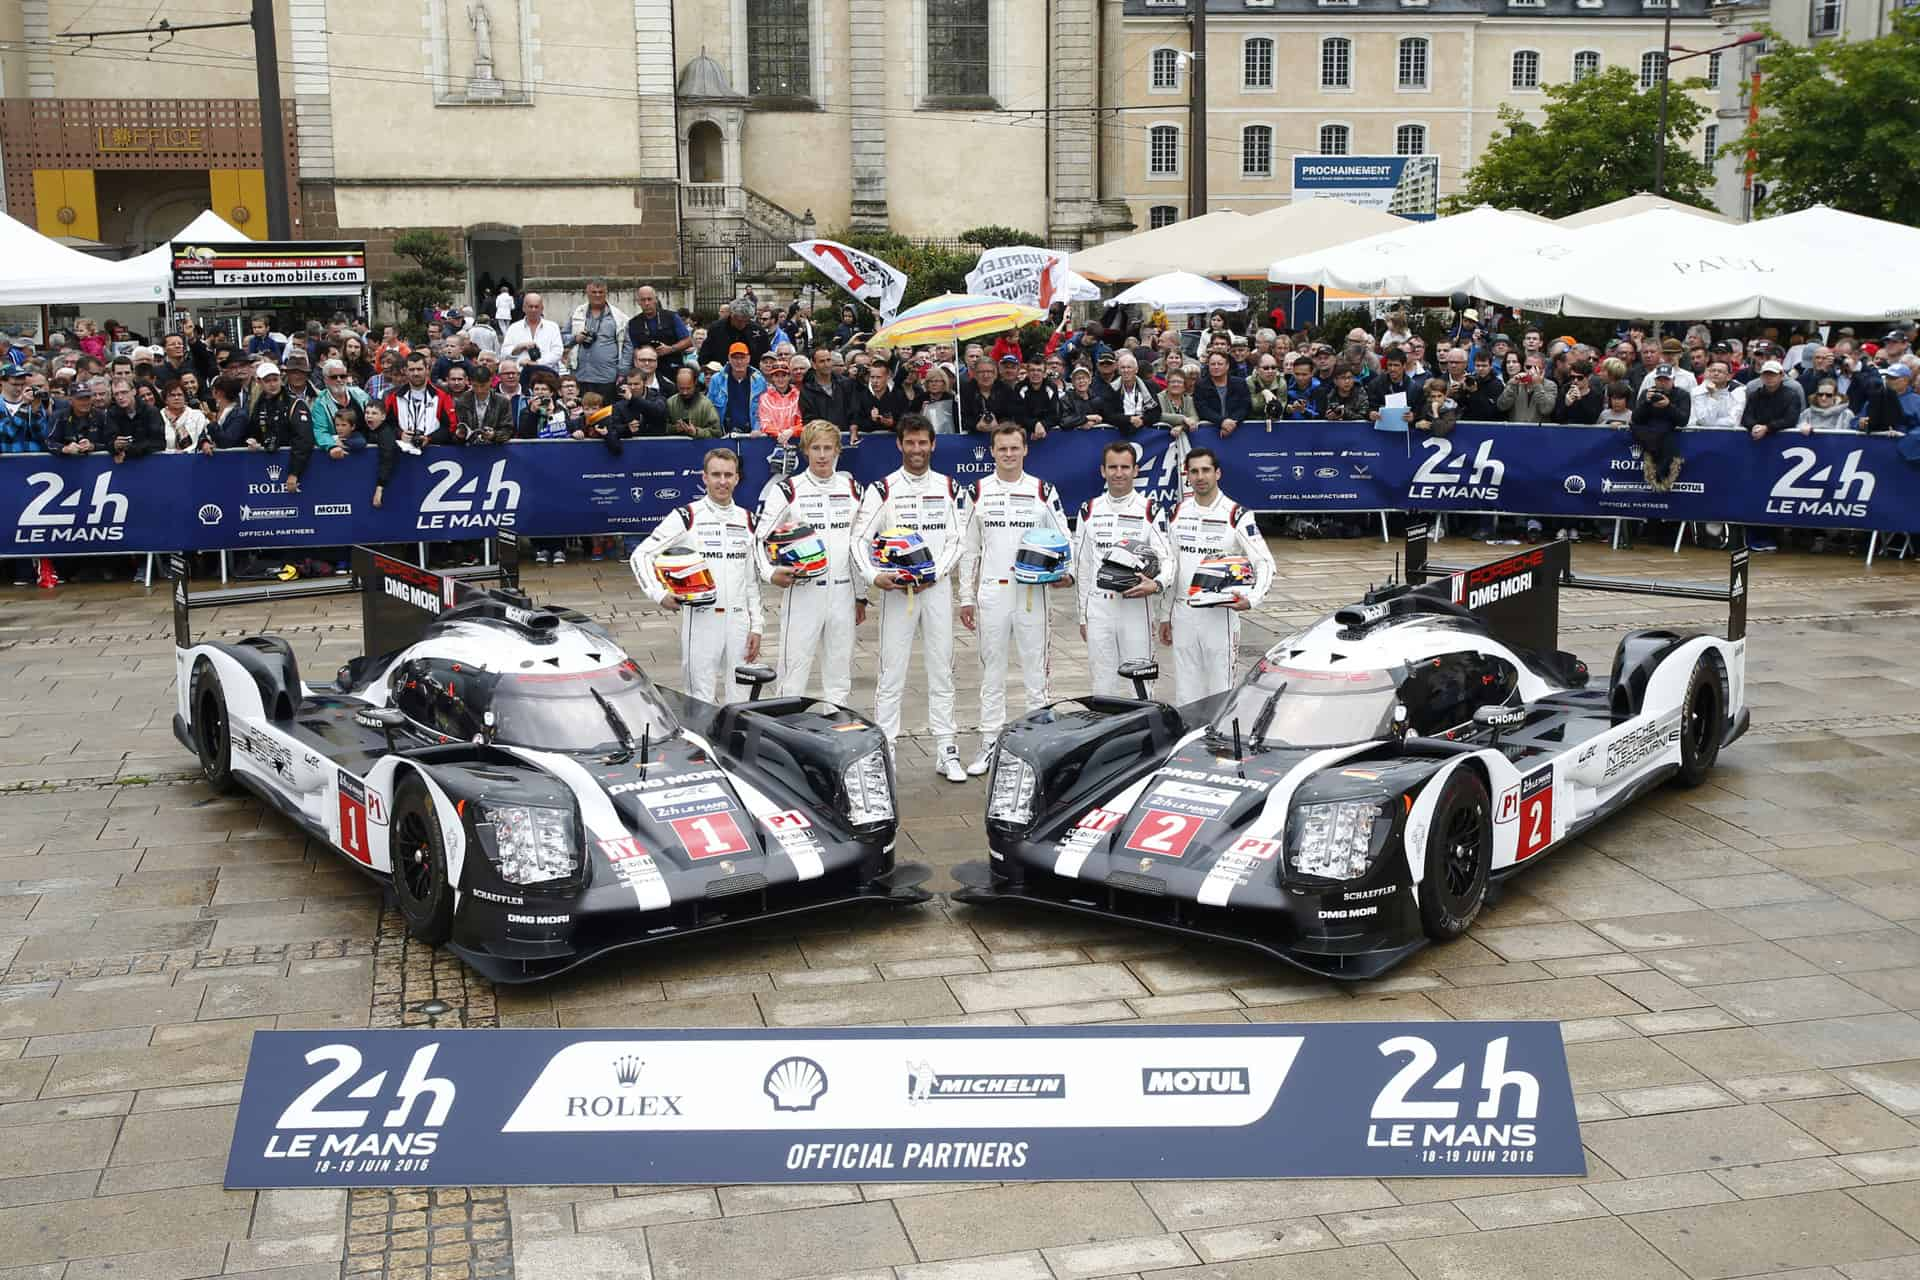 Porsche 919 Hybrid, Porsche Team 1: Timo Bernhard, Brendon Hartley, Mark Webber, Porsche Team 2: Marc Lieb, Romain Dumas, Neel Jani (l-r)